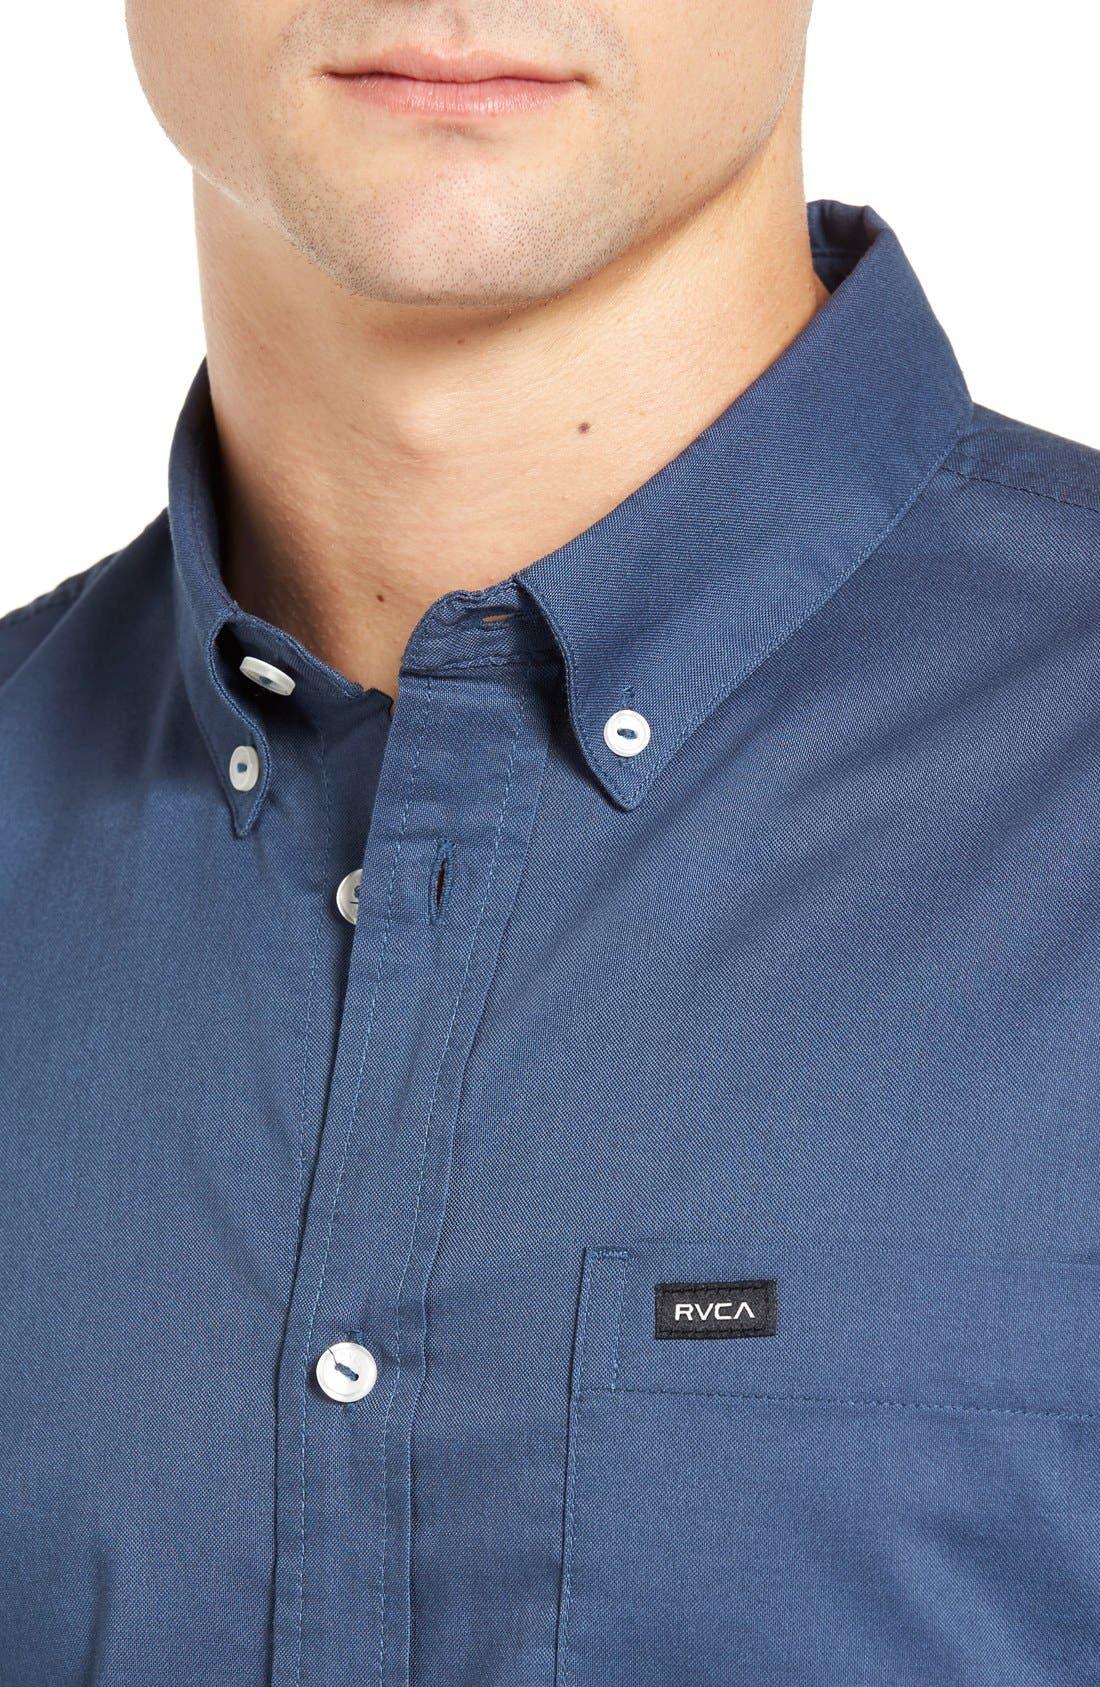 Alternate Image 4  - RVCA 'That'll Do' Slim Fit Oxford Shirt